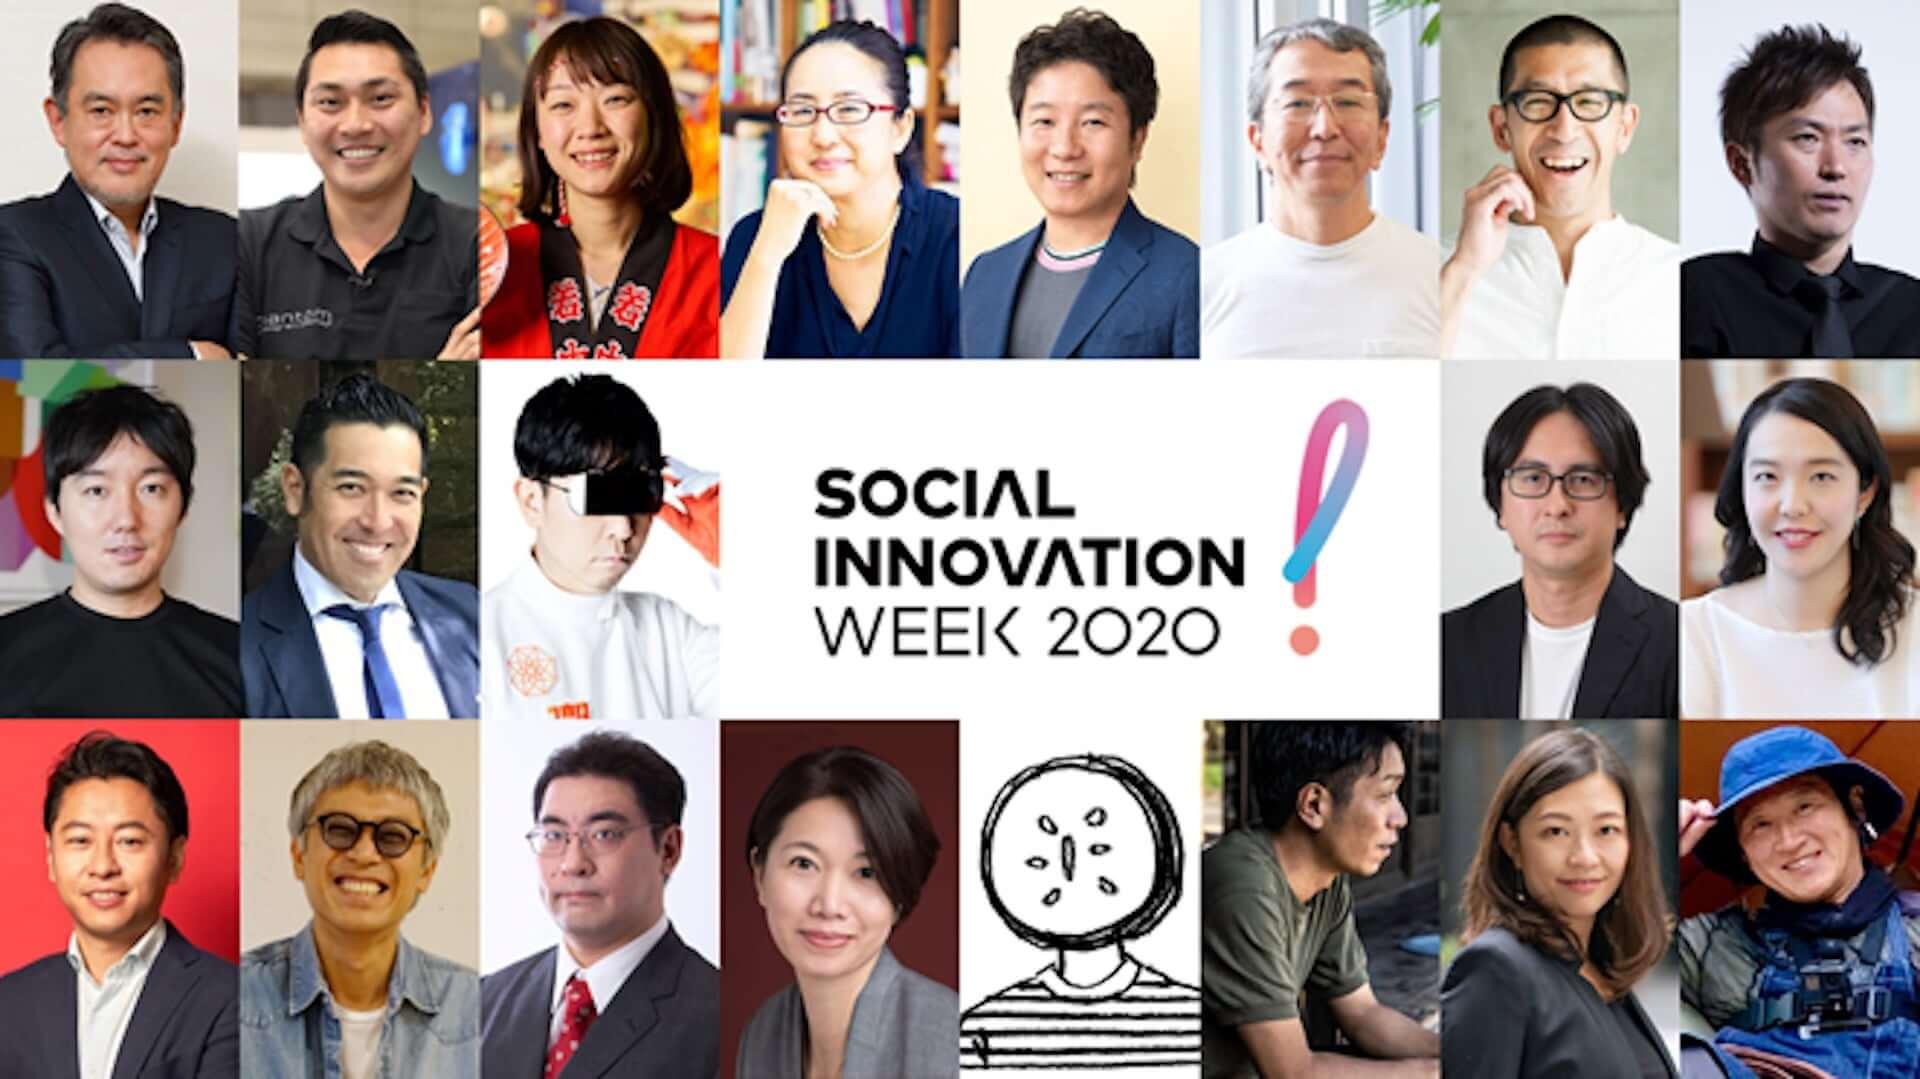 <SOCIAL INNOVATION WEEK SHIBUYA 2020>のカンファレンスに☆Taku Takahashiら21名が参加決定!無料配信も実施 art200925_siw2020_1-1920x1079